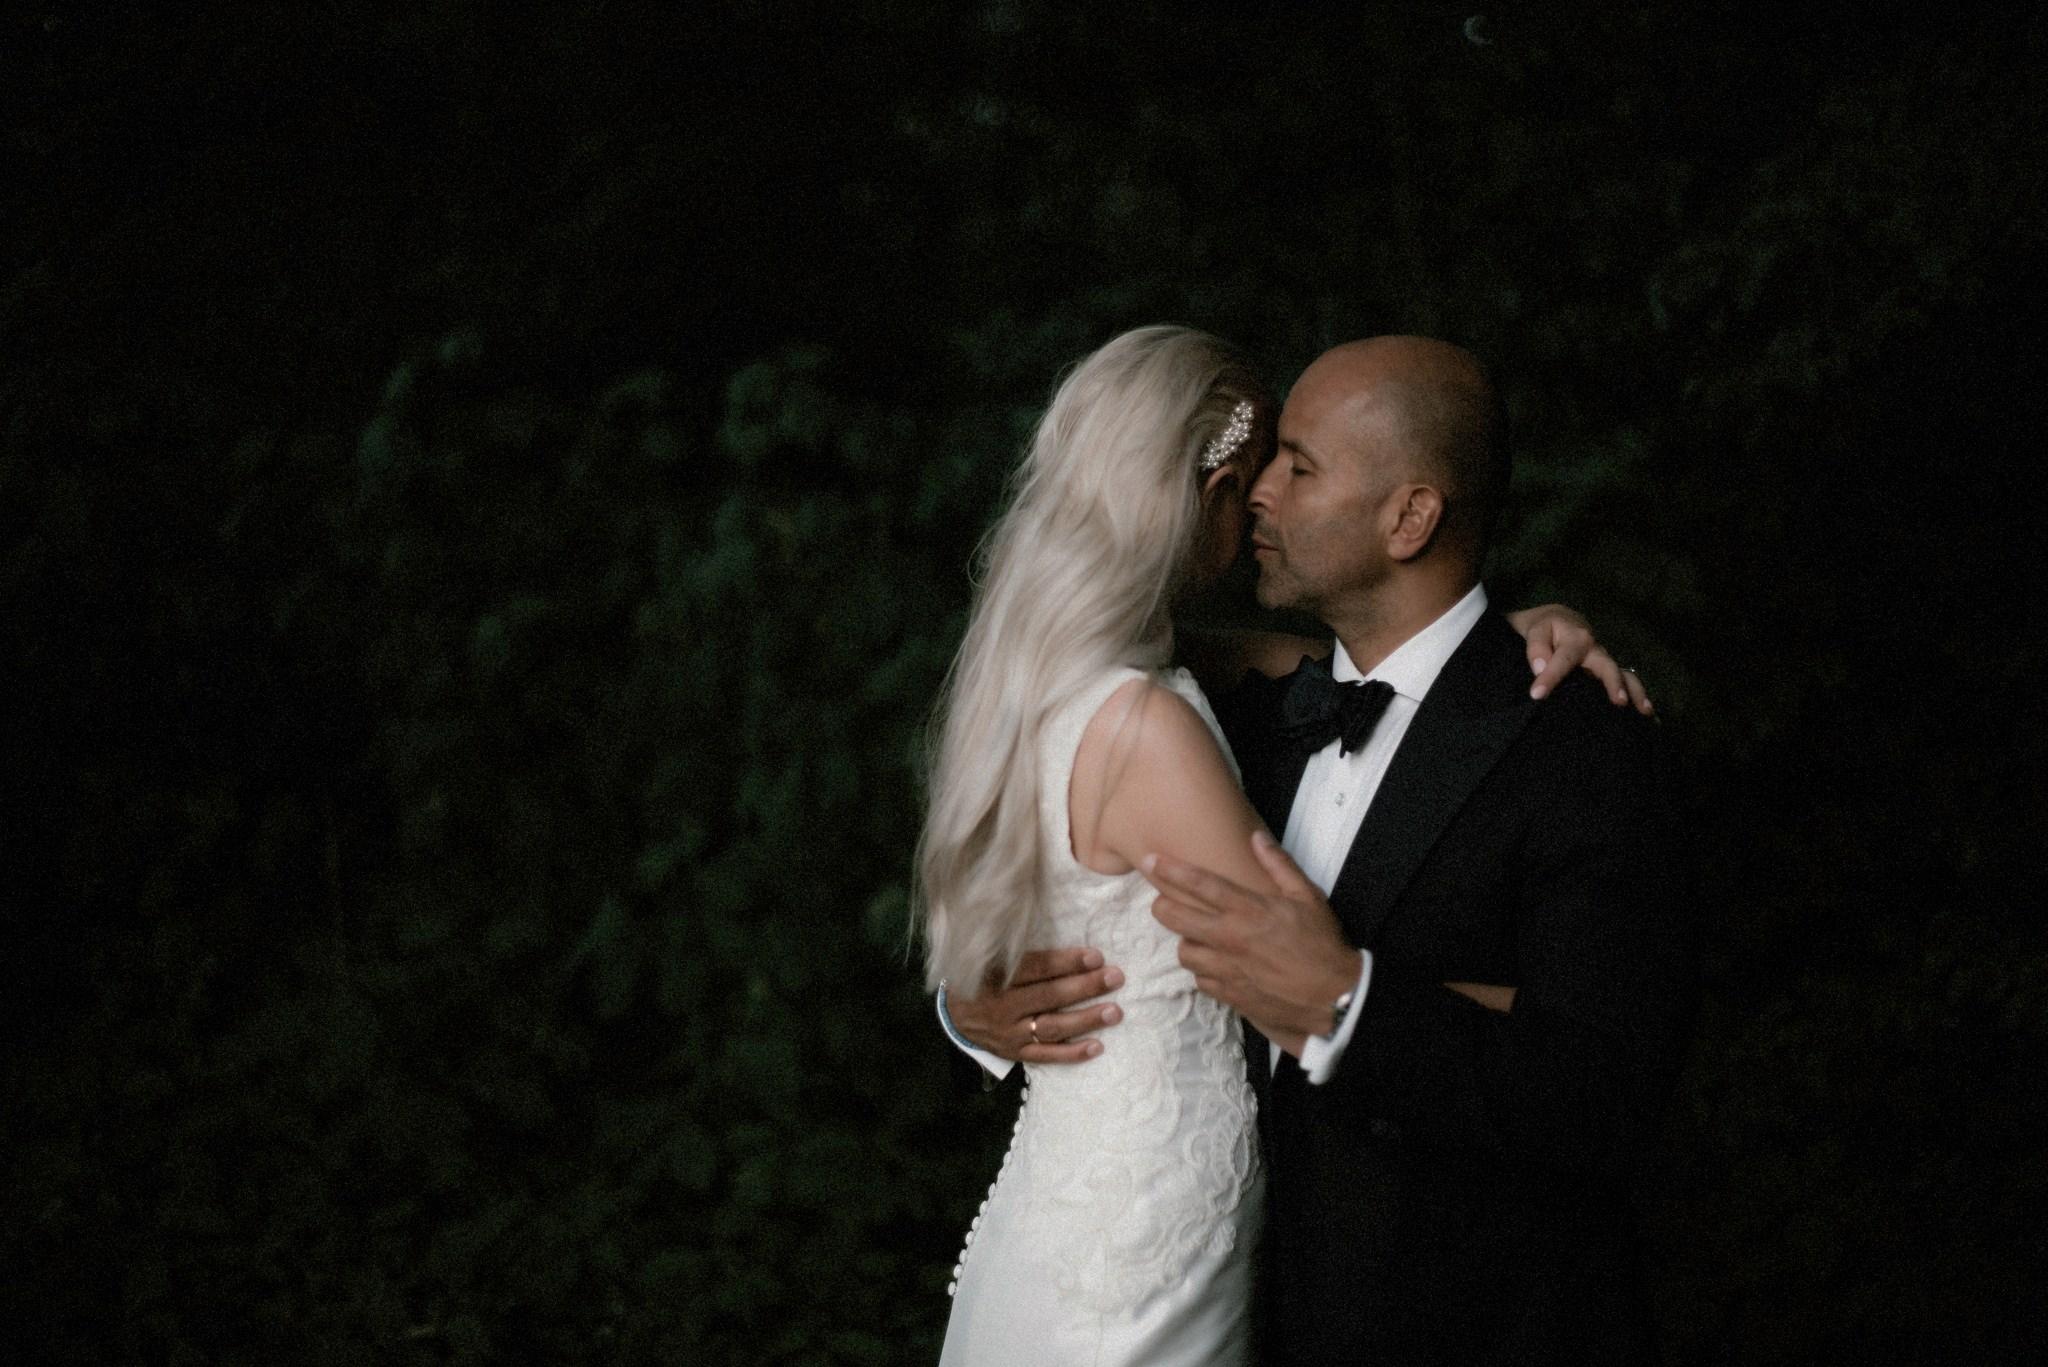 Bruidsfotografie Buitenplaats Sparrendaal - Naomi van der Kraan 0078.jpg